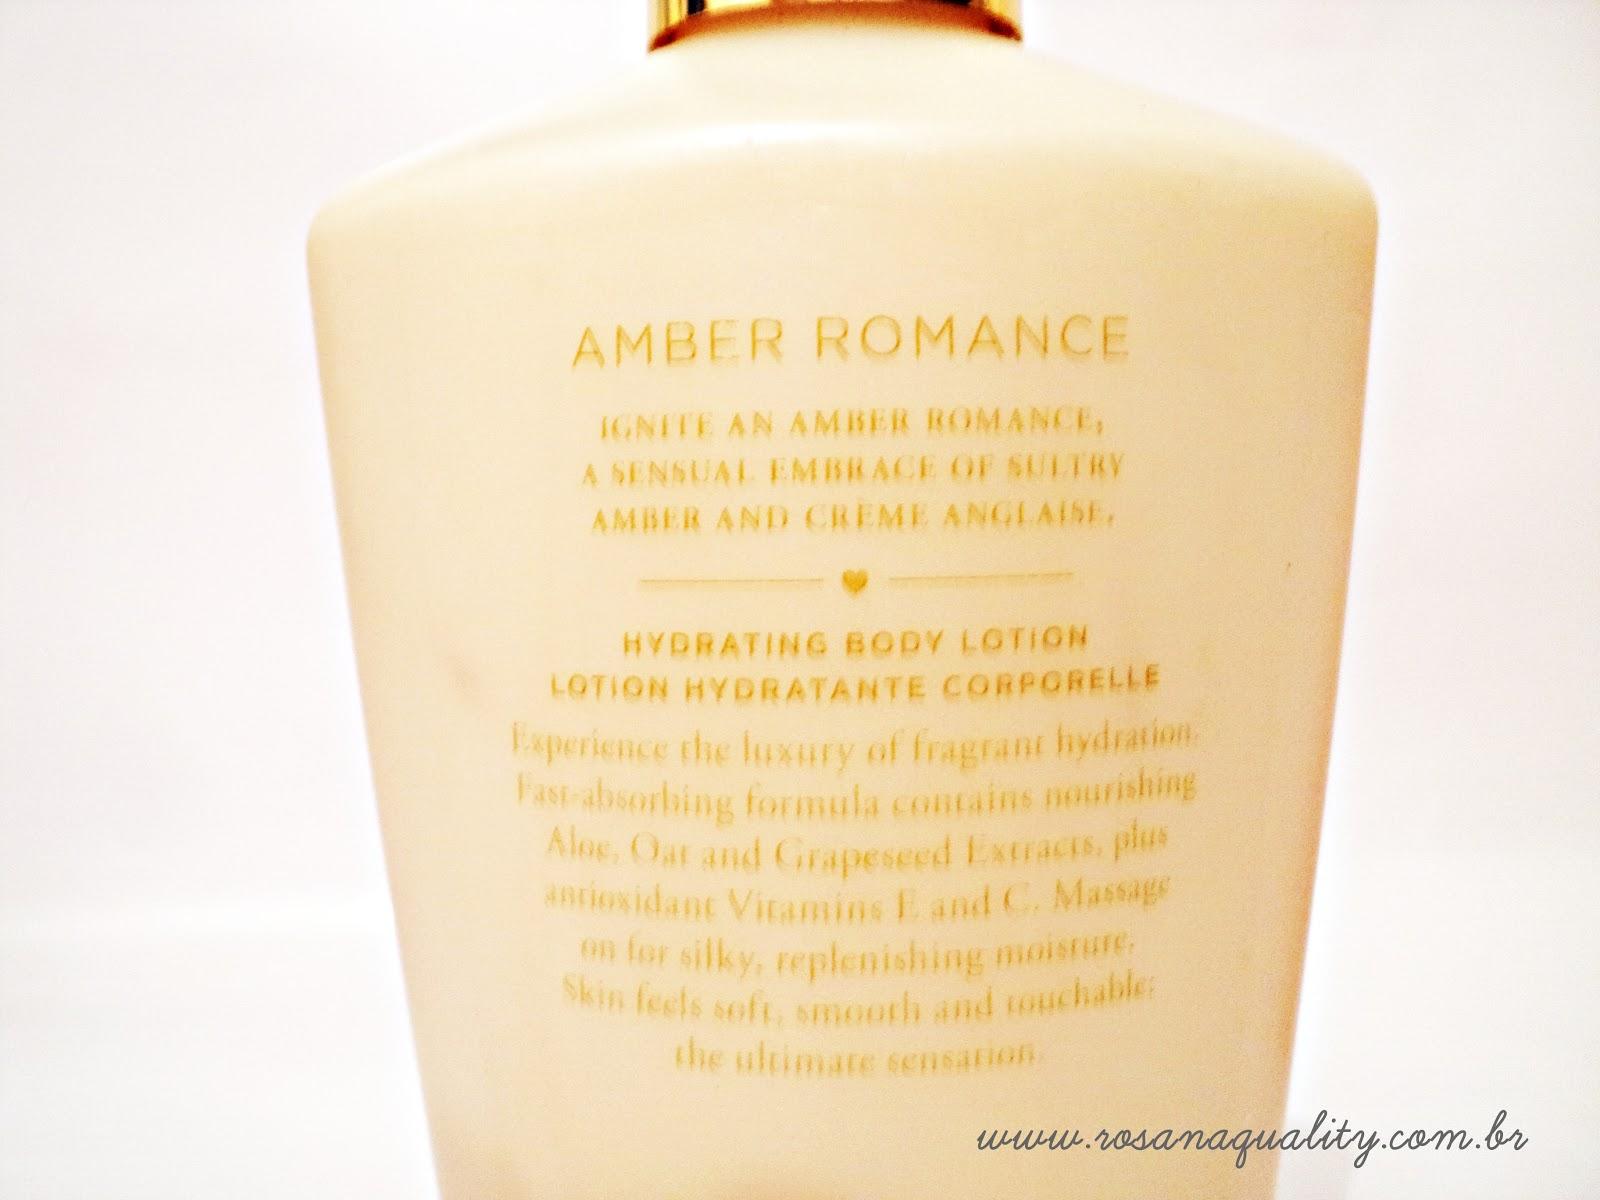 Amber Romance Victoria's Secrets